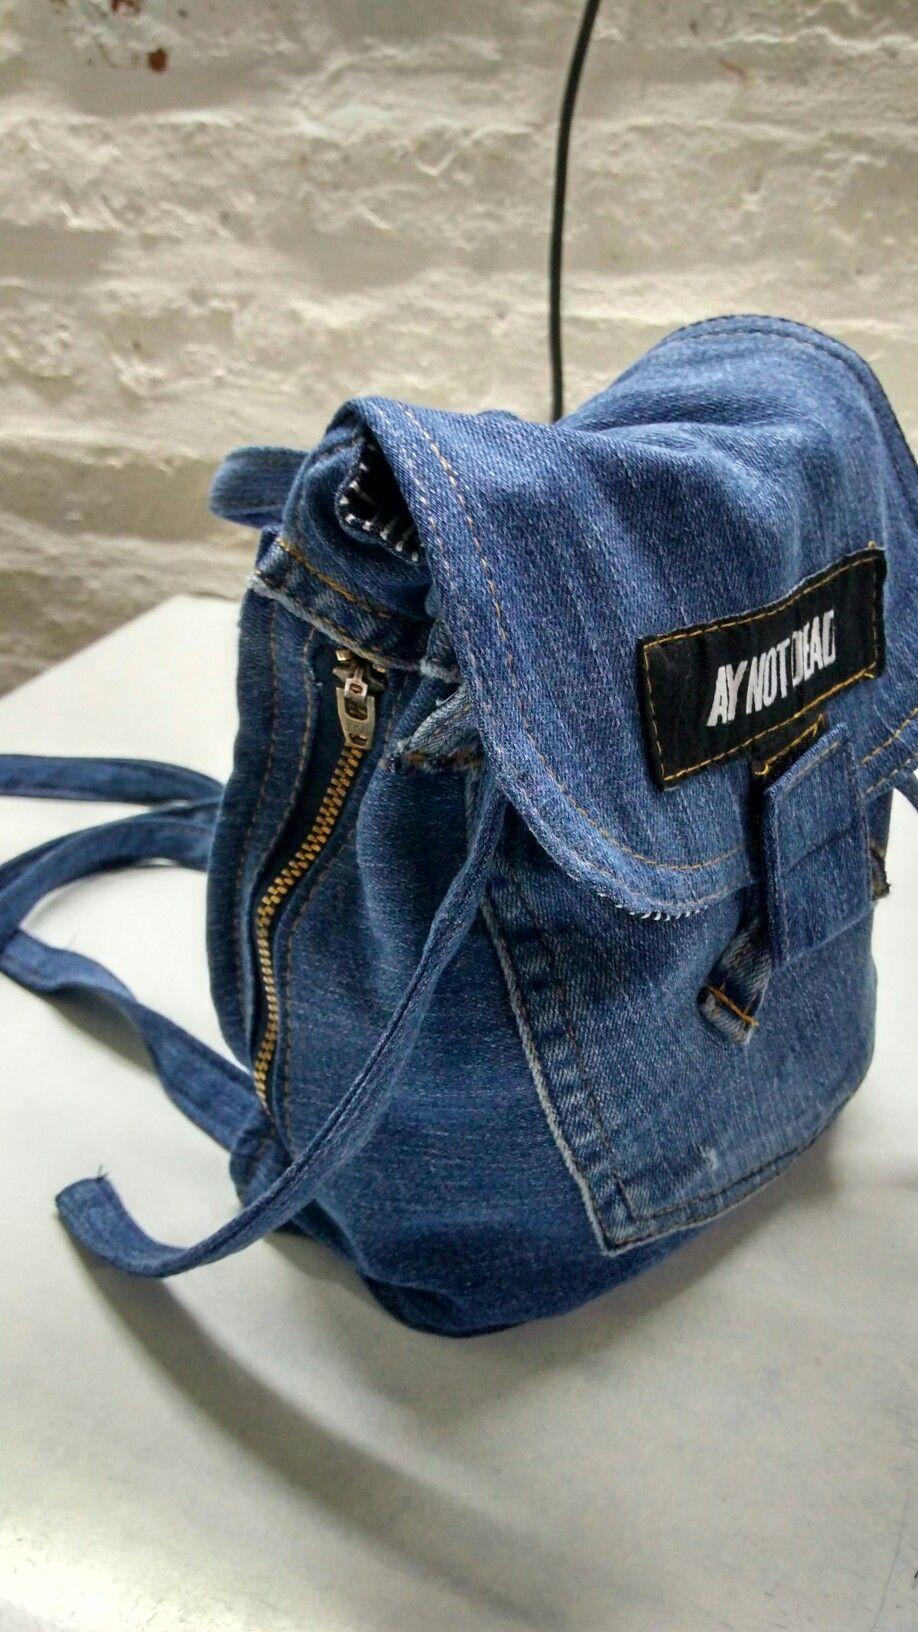 Práctica mochila de un jean viejo